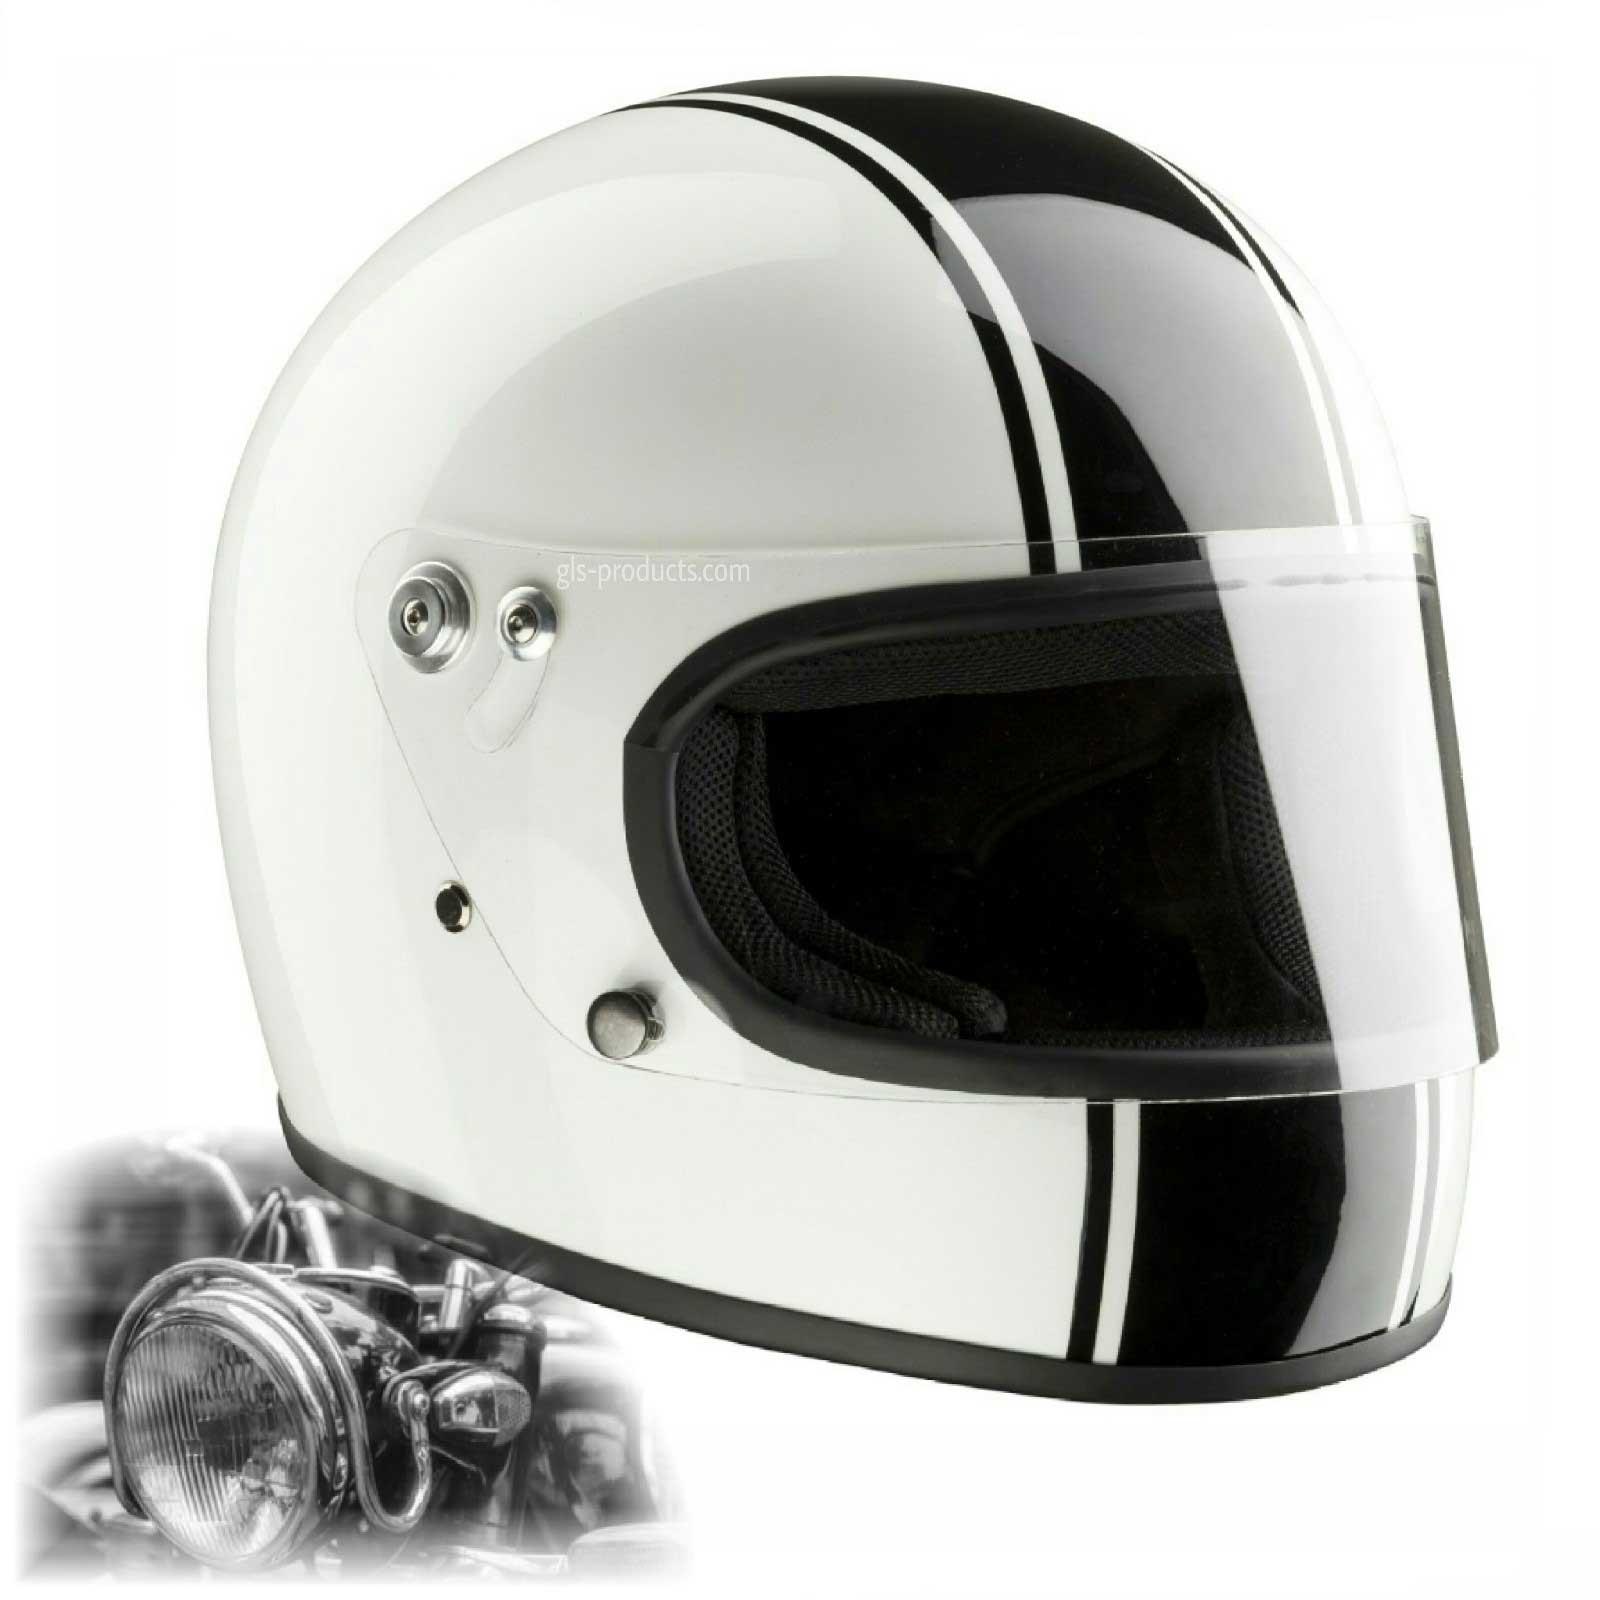 bandit integral ece 22 05 homologated retro motorcycle helmet. Black Bedroom Furniture Sets. Home Design Ideas